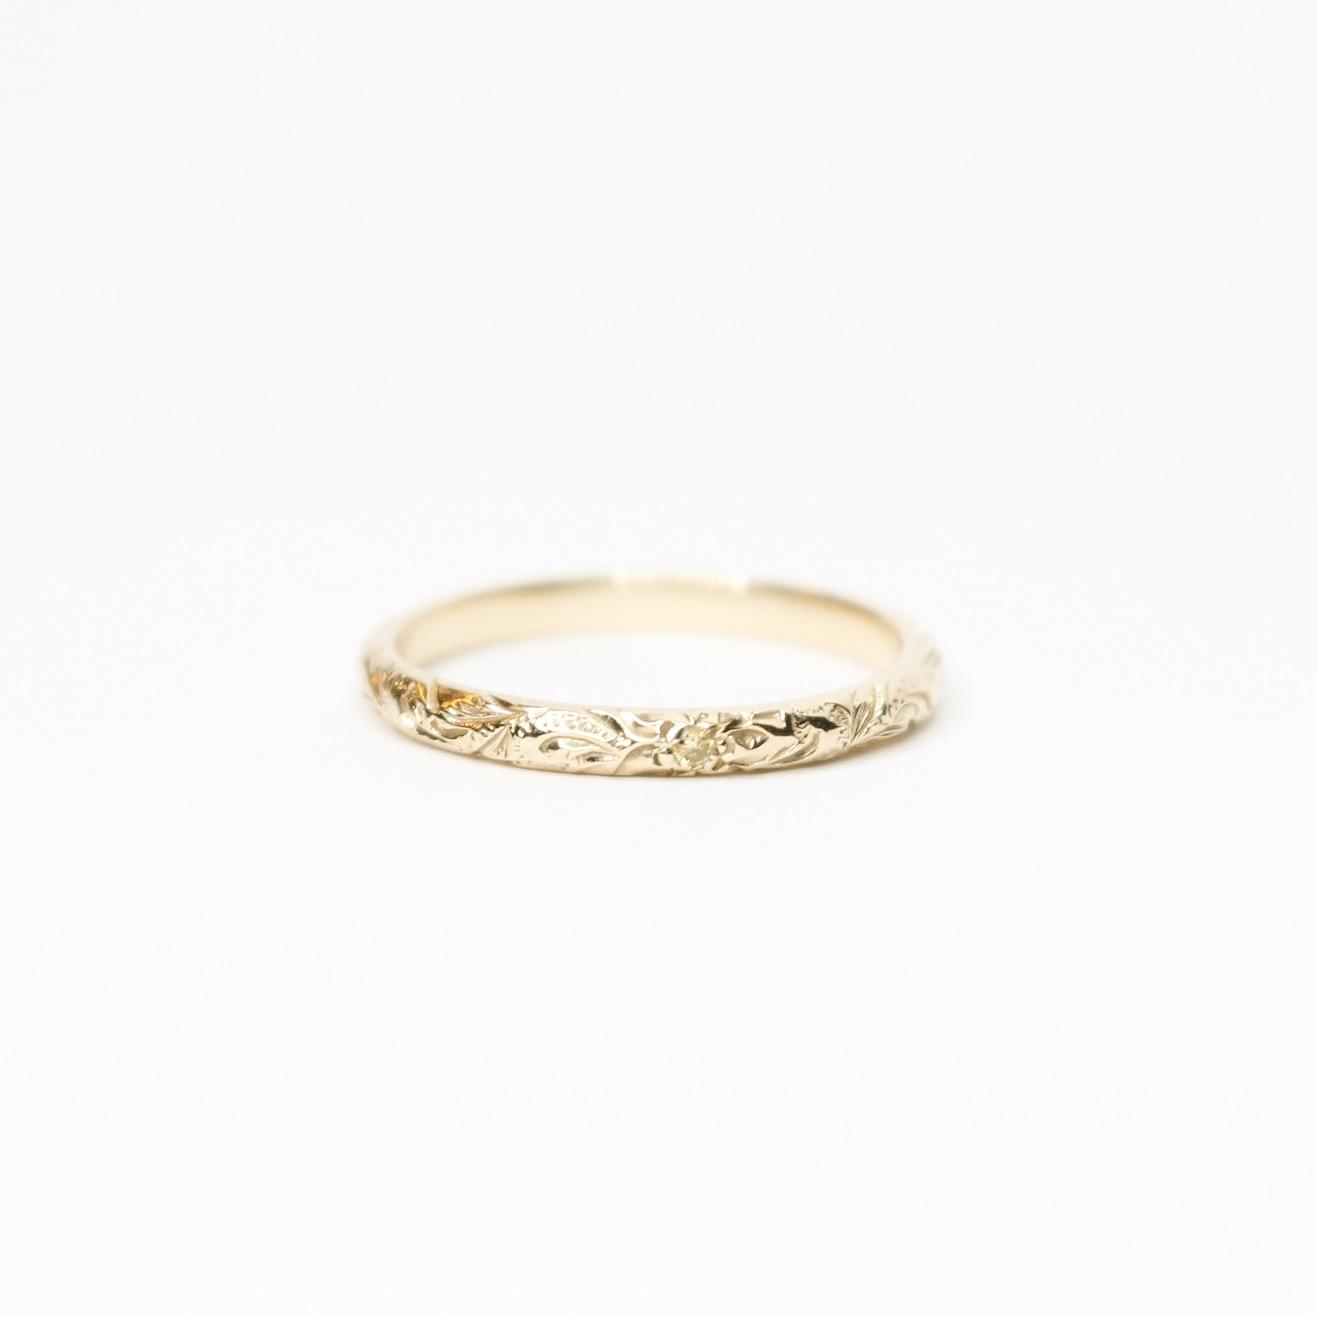 TINY DIAMOND RING